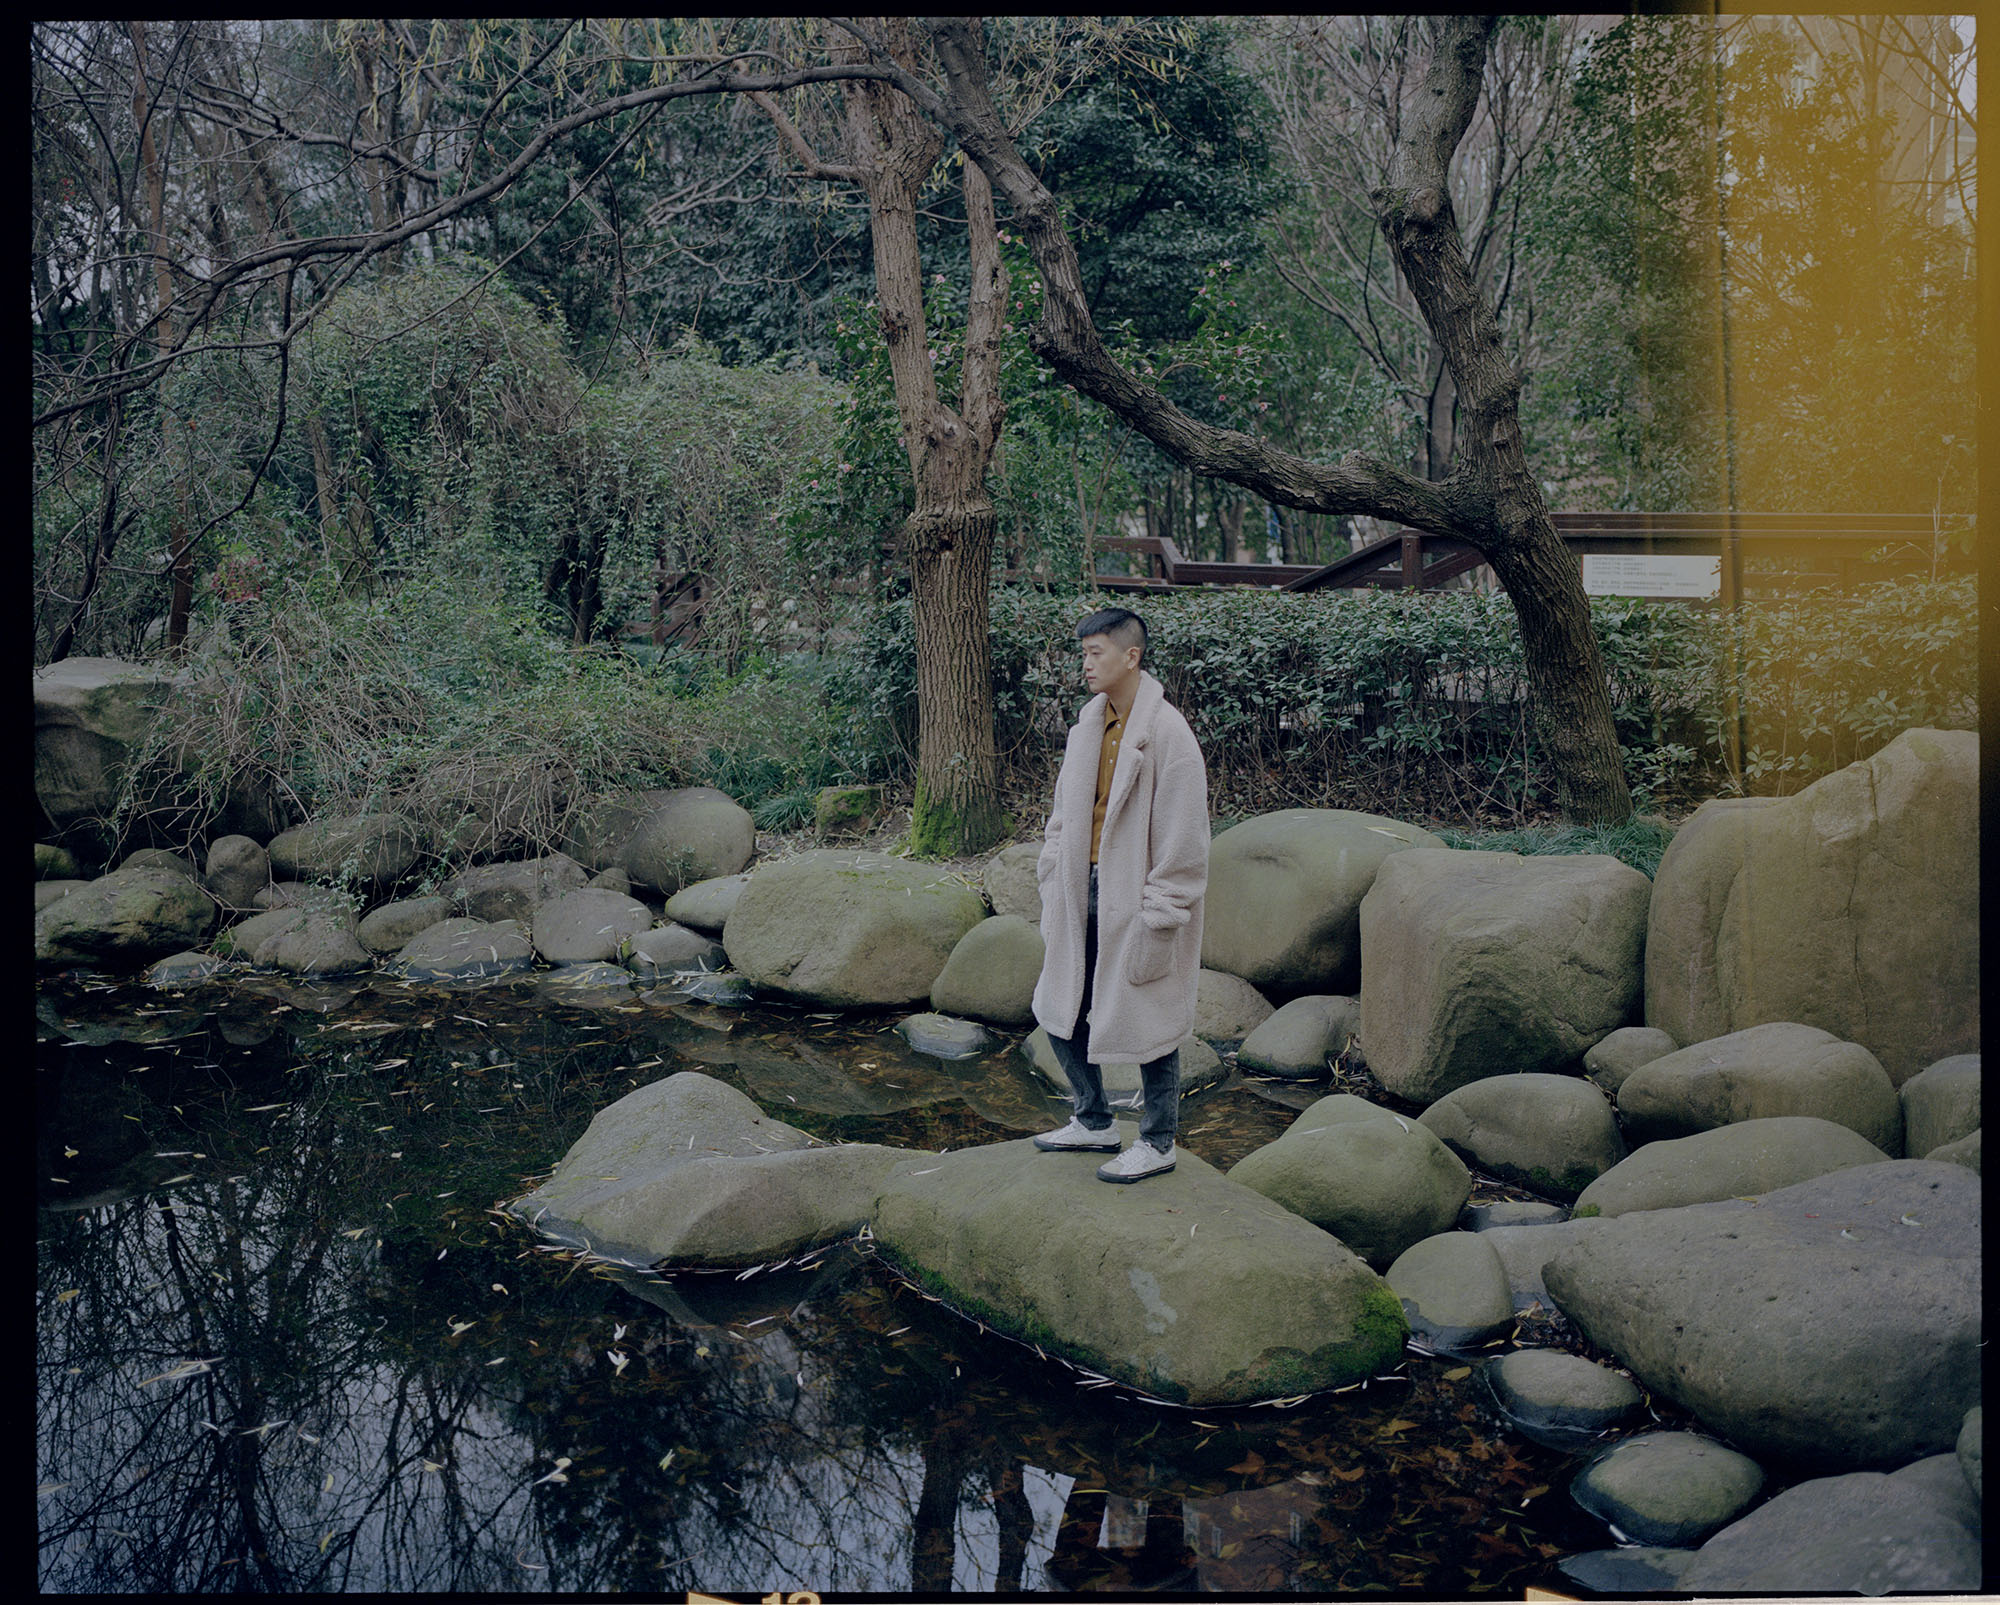 Photography  Joanna Legid  Talents  Ebi ,  Steph    &  Romuald  Styling & Production  Anna Baur  MUA  Victoria Reuter  shot for the Radical Soft issue of  Blonde Magazine